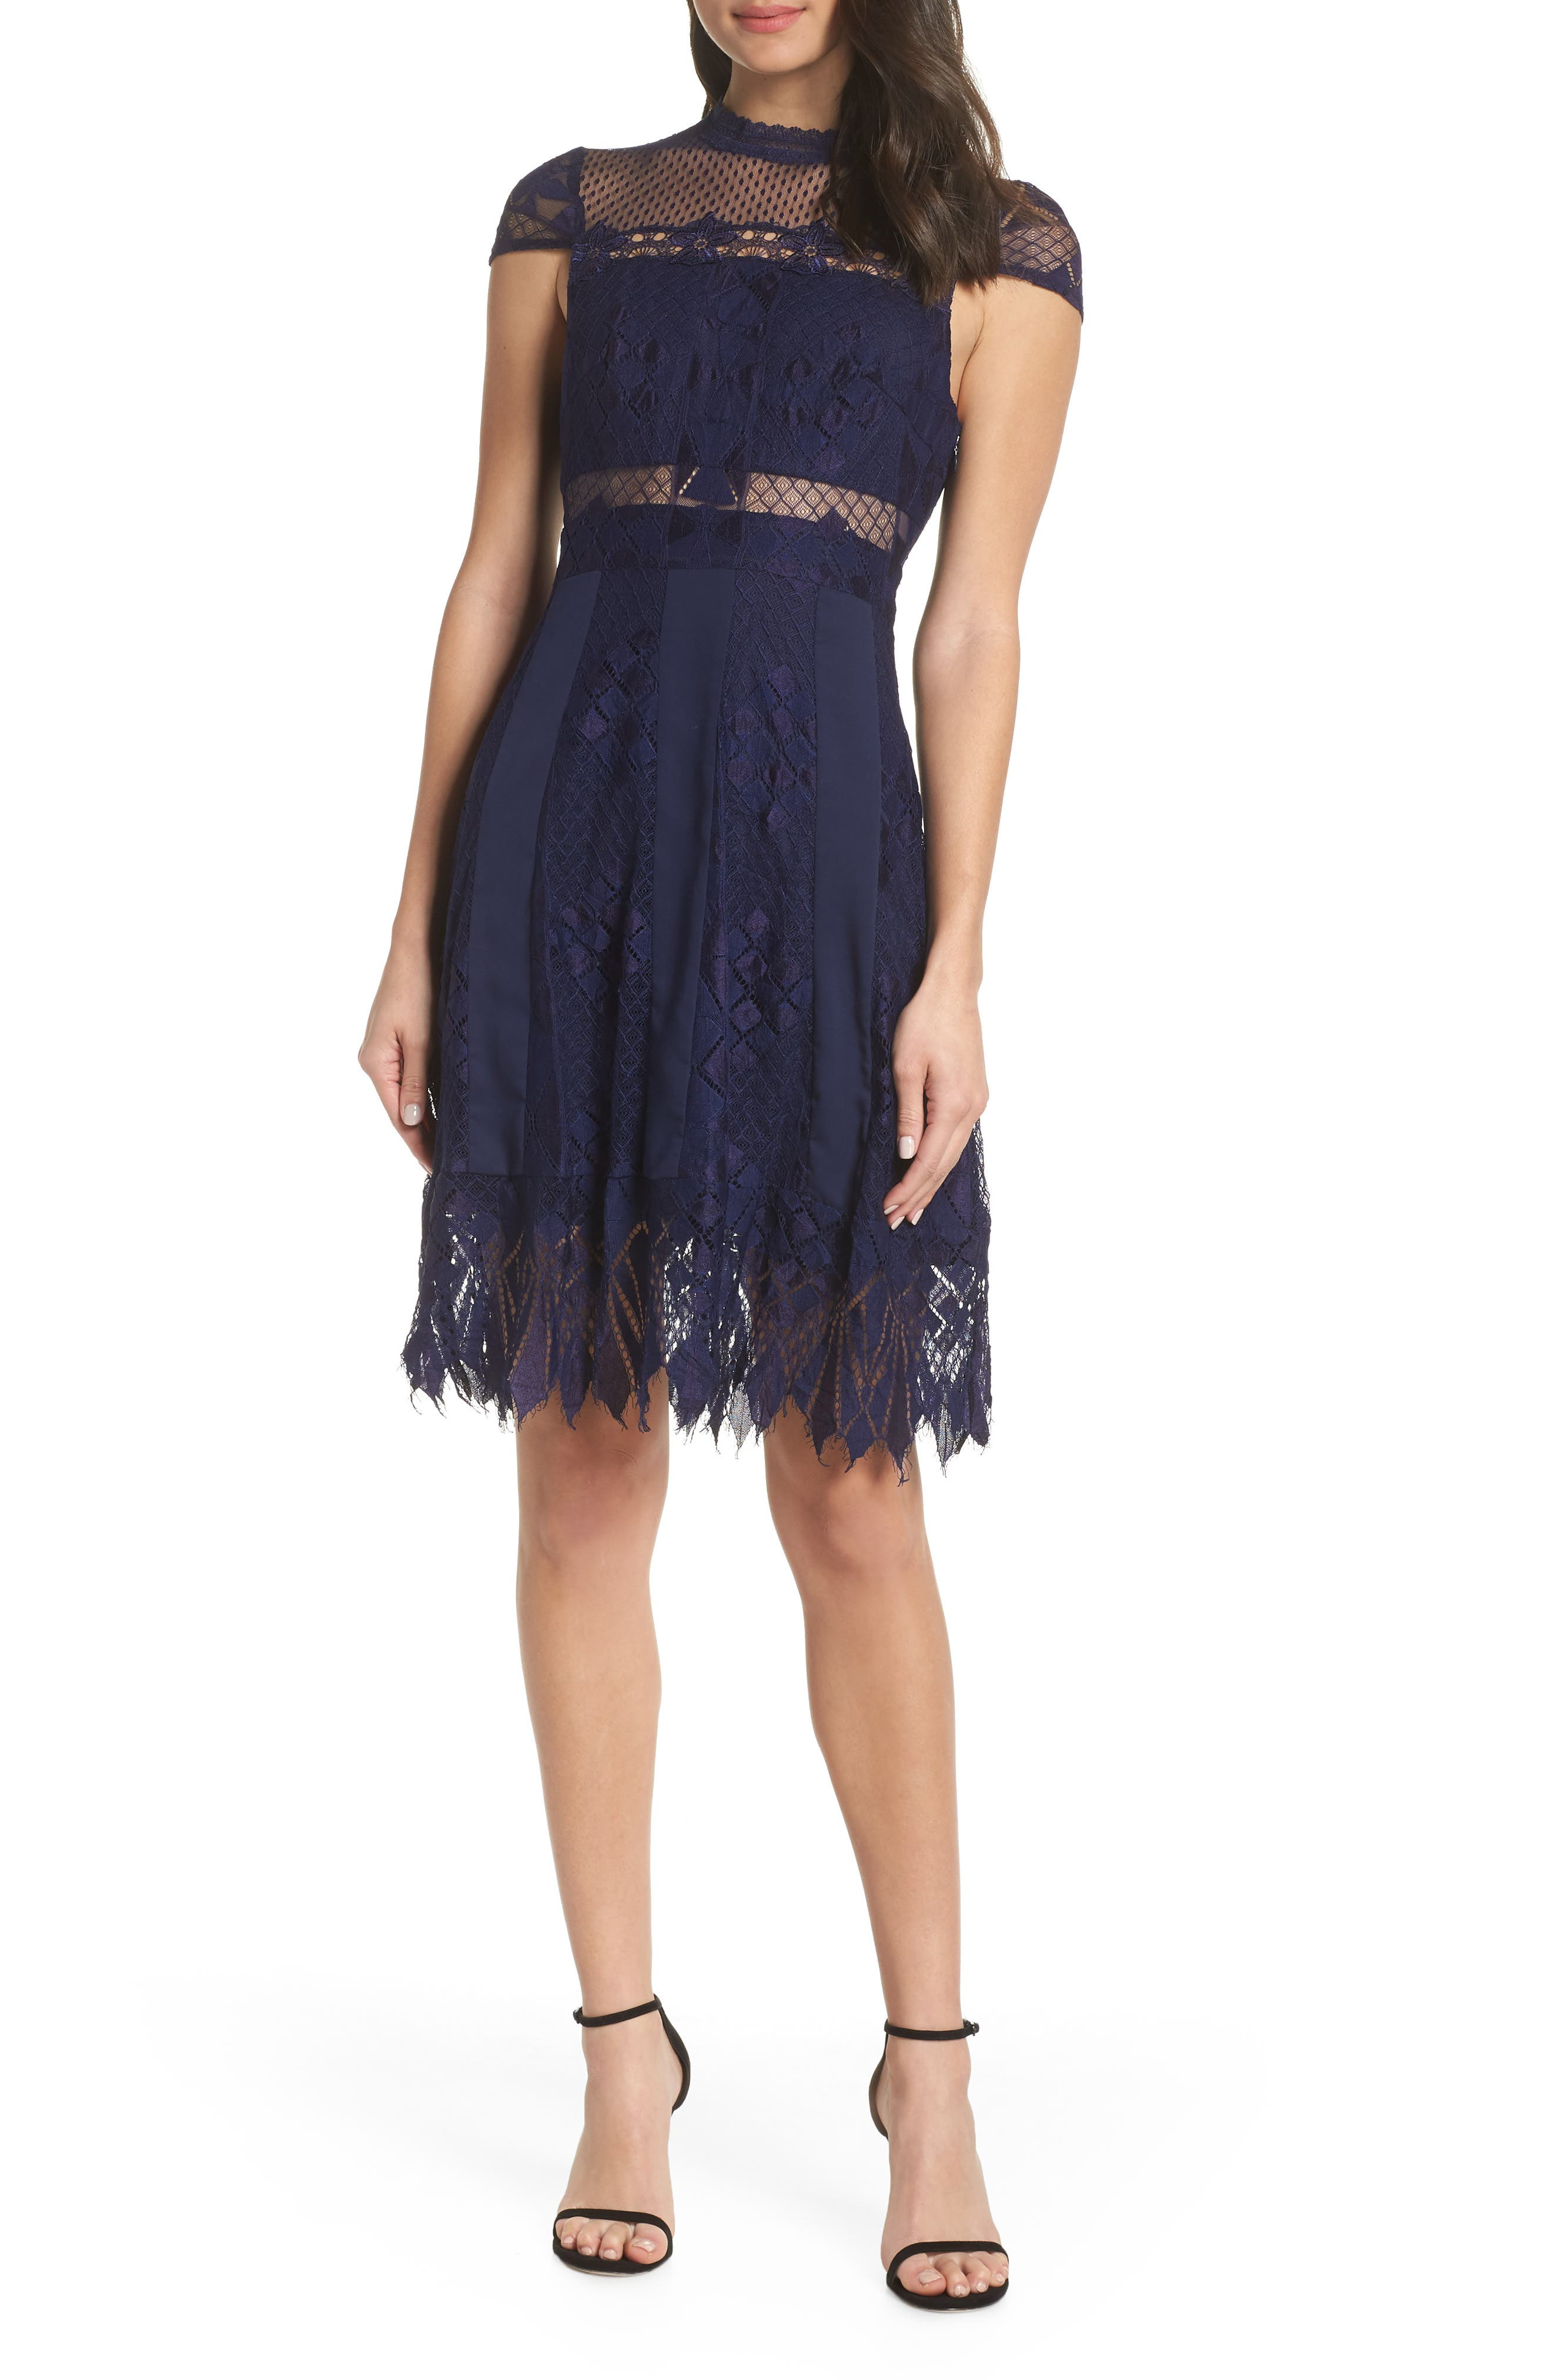 Foxiedox Bravo Zulu Lace Fit & Flare Cocktail Dress, Blue